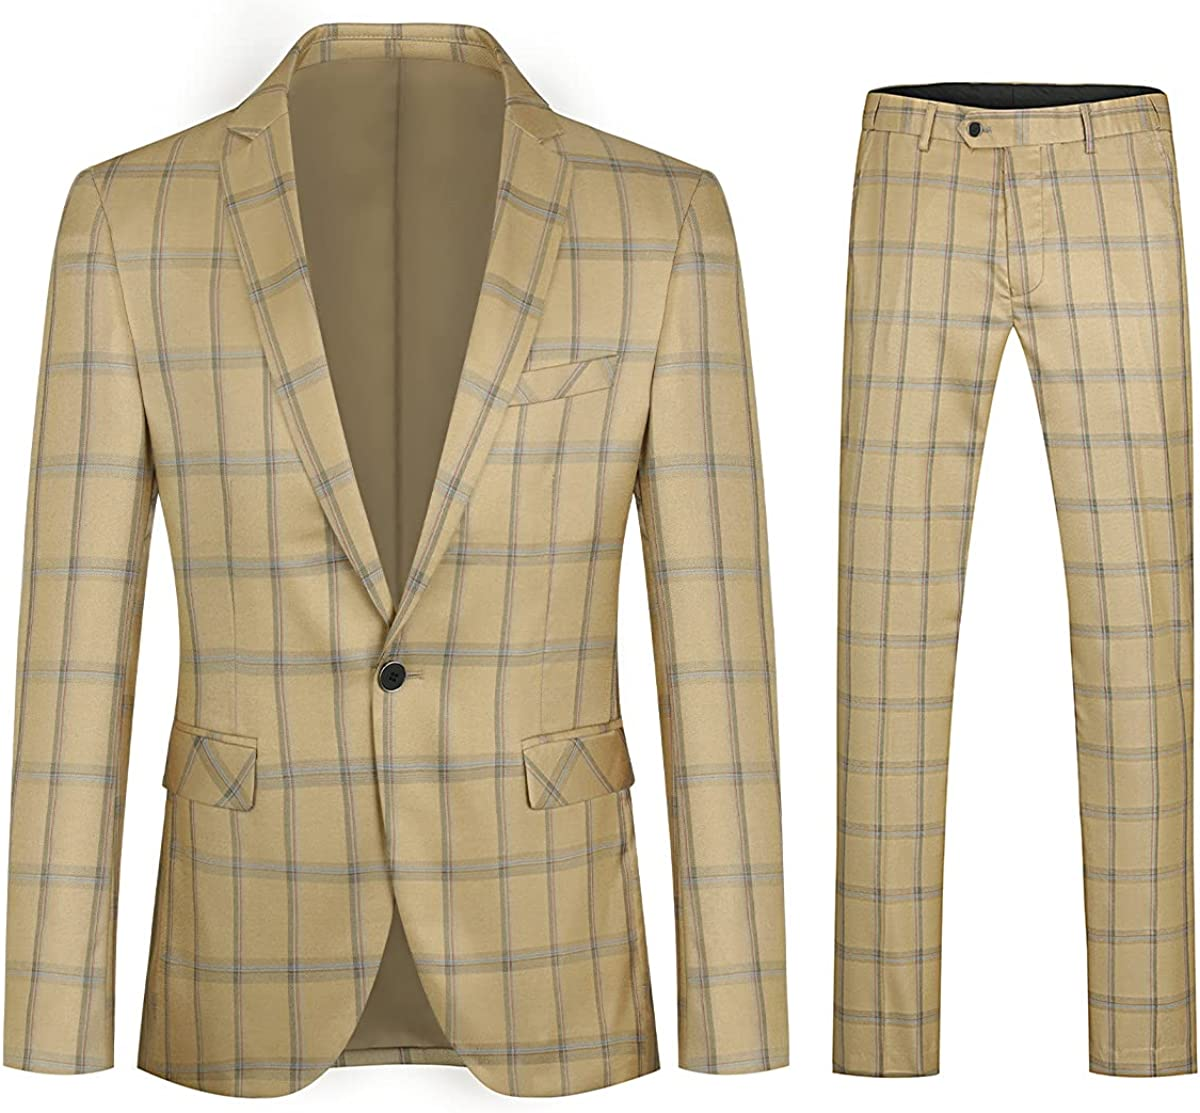 Mens Dress Suit 2 Piece Checked Plaid 1 Button Single-Breasted Slim Fit Blazer Pants Sets